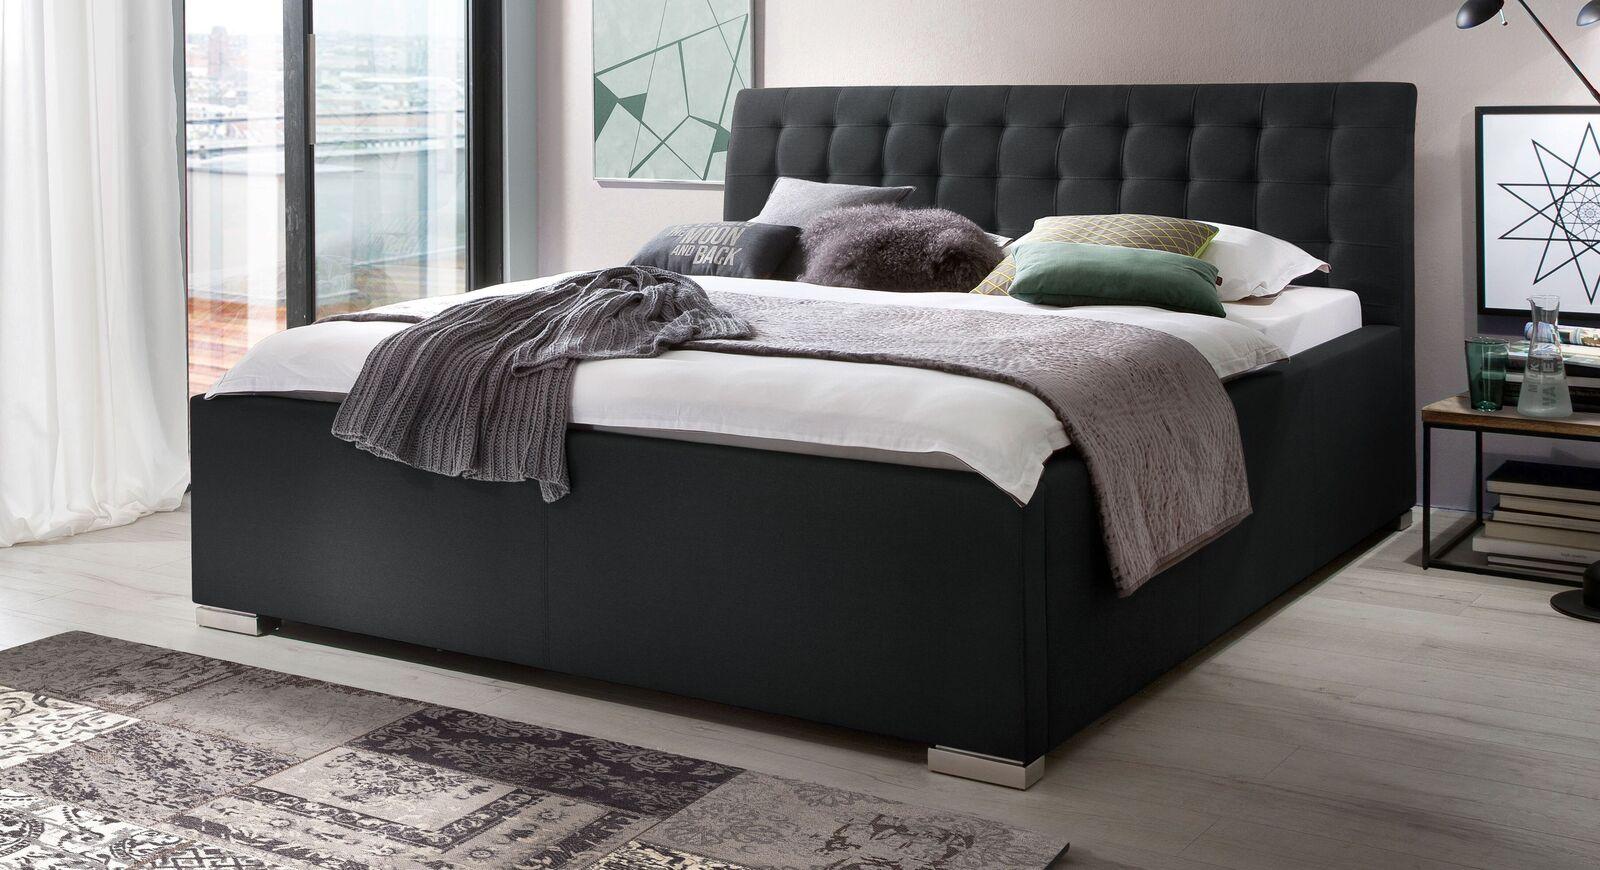 Bett Setiara mit schwarzem Stoffbezug